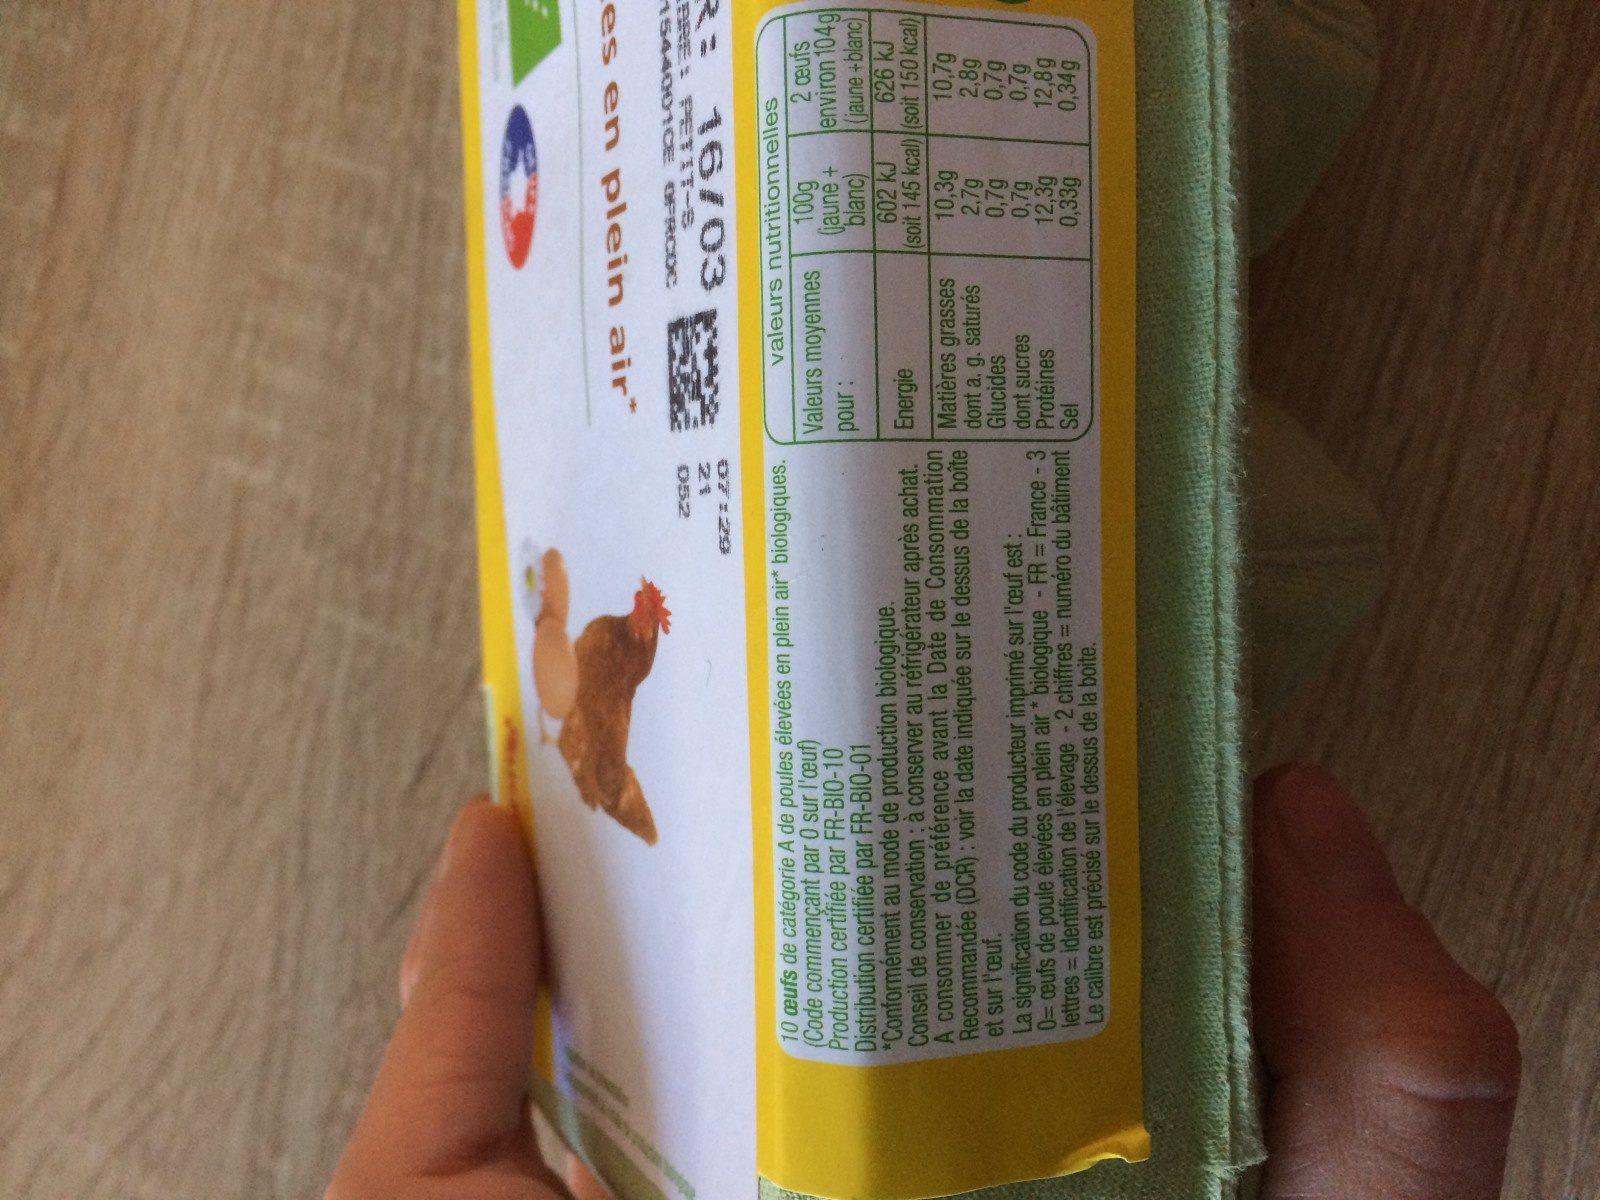 10 Oeufs Bios - Ingrediënten - fr